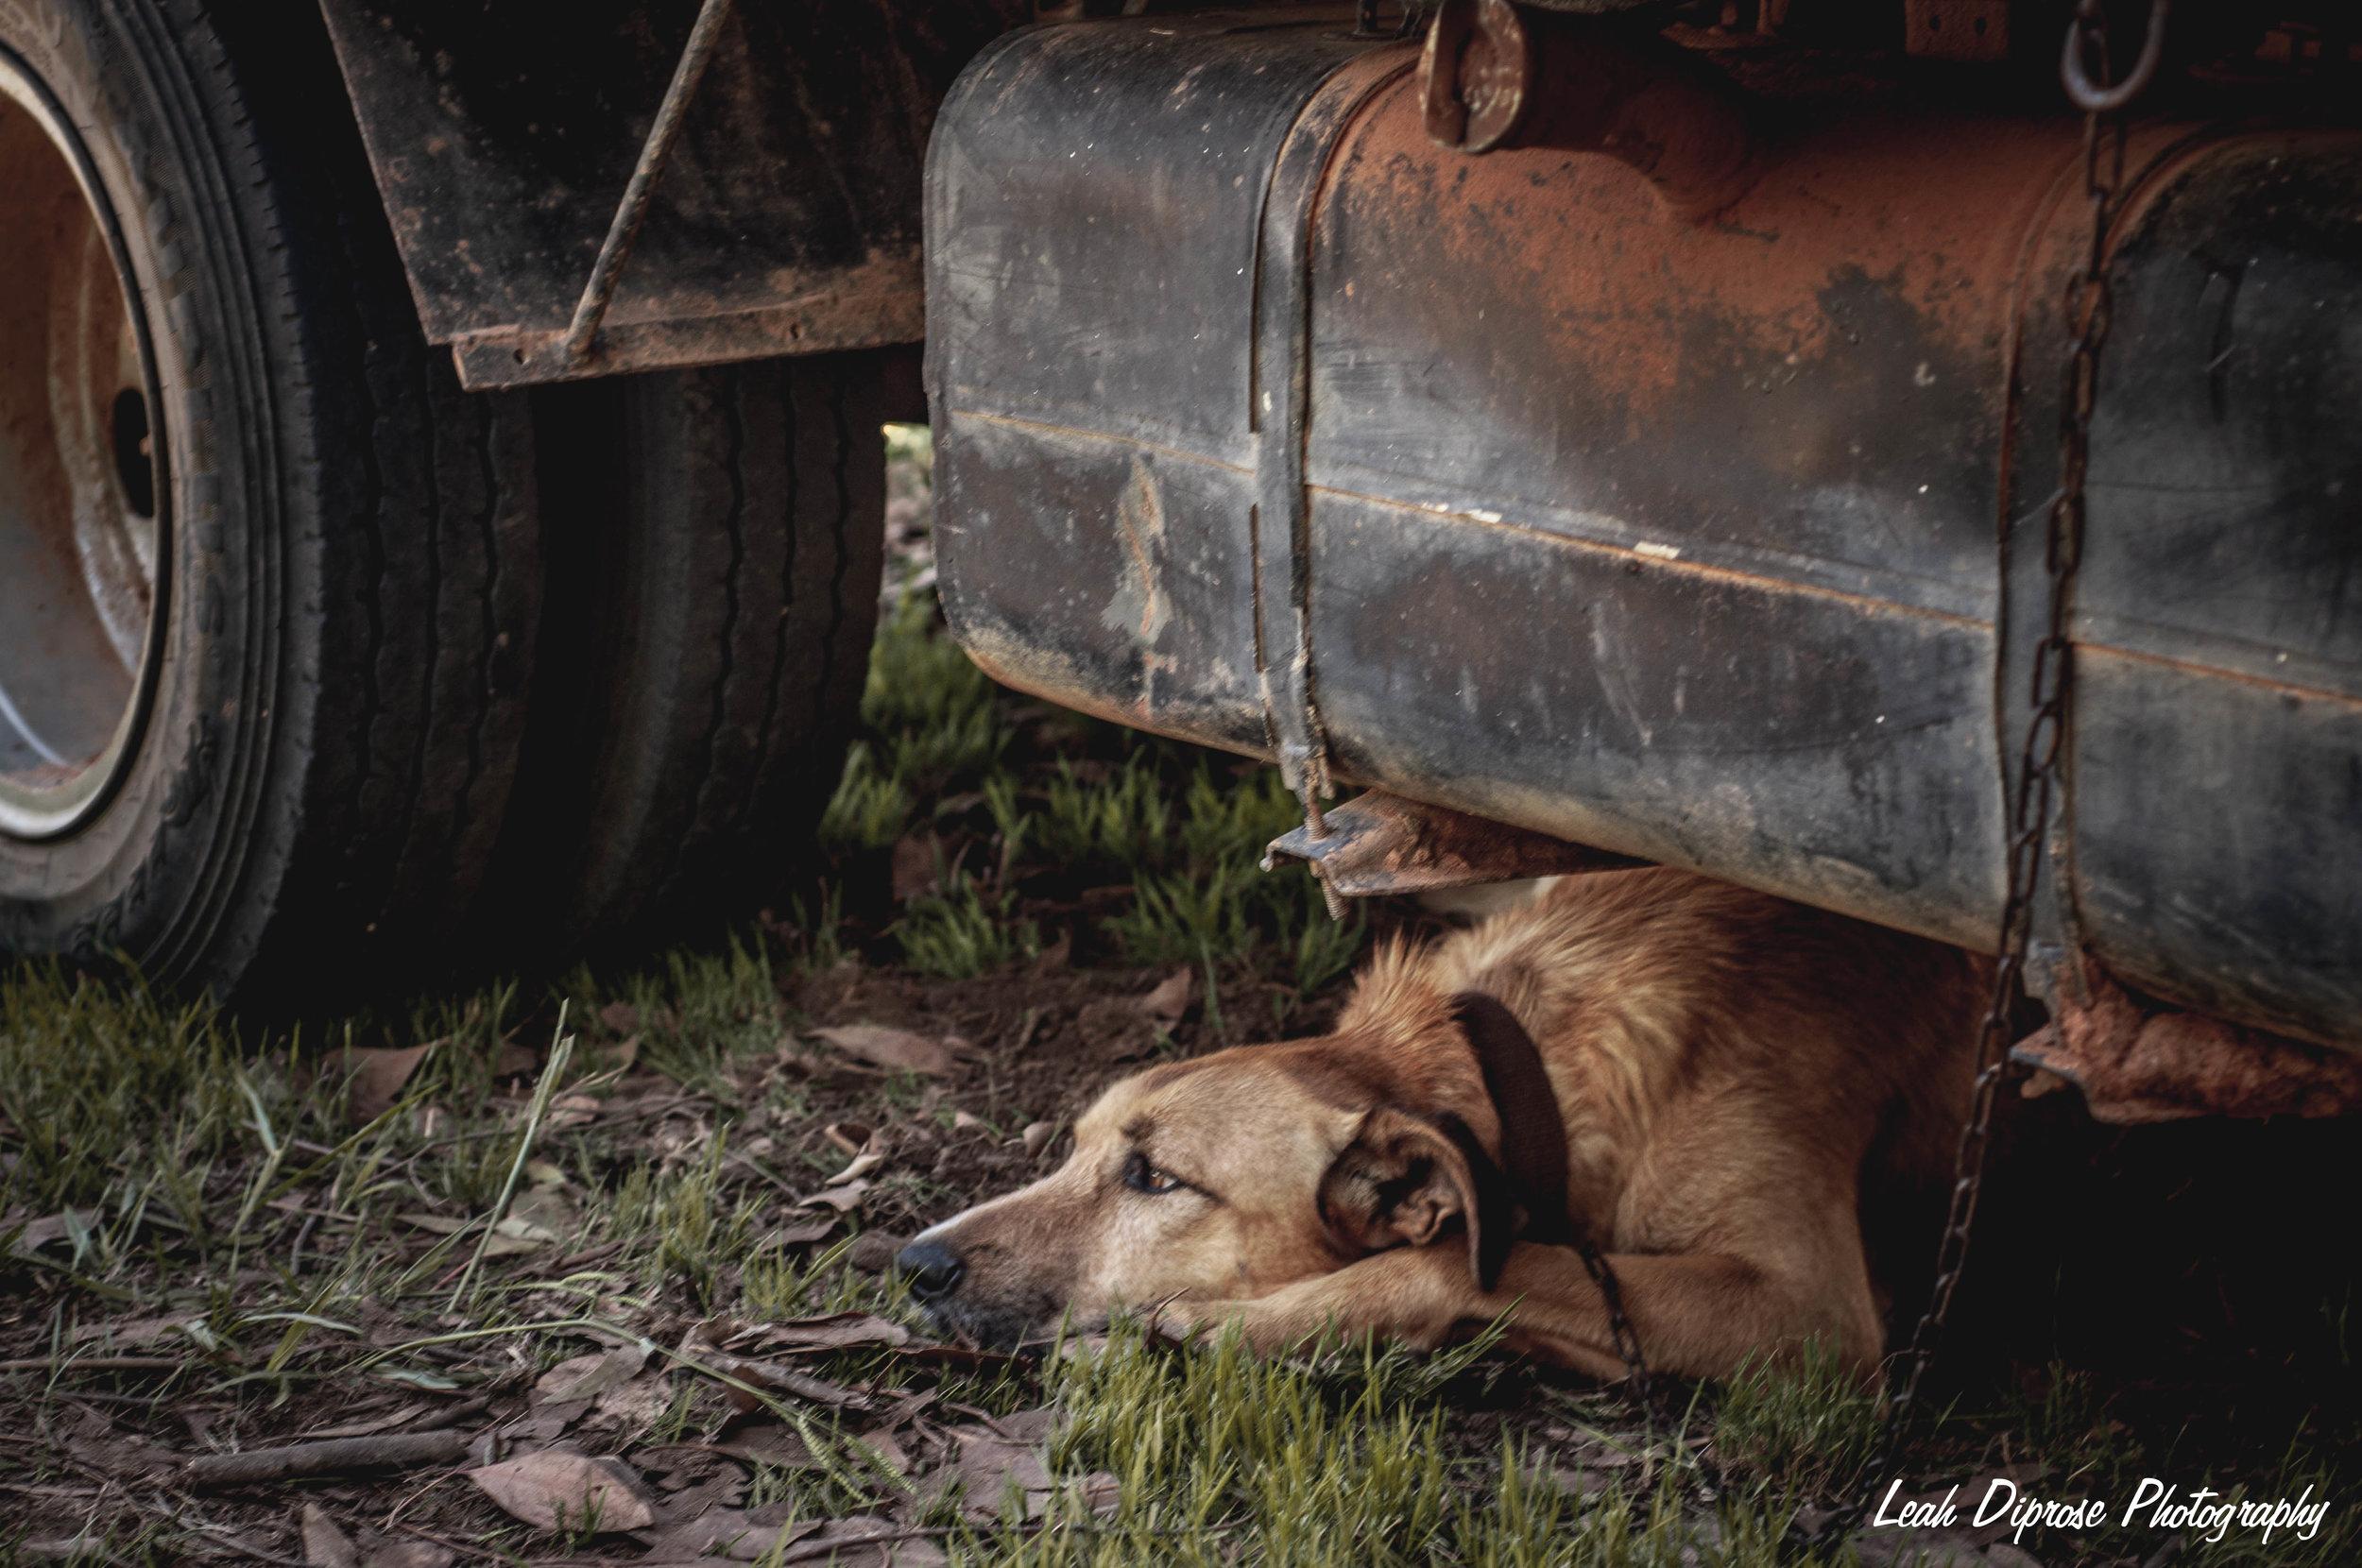 Leah Diprose Photography image-6215.jpg